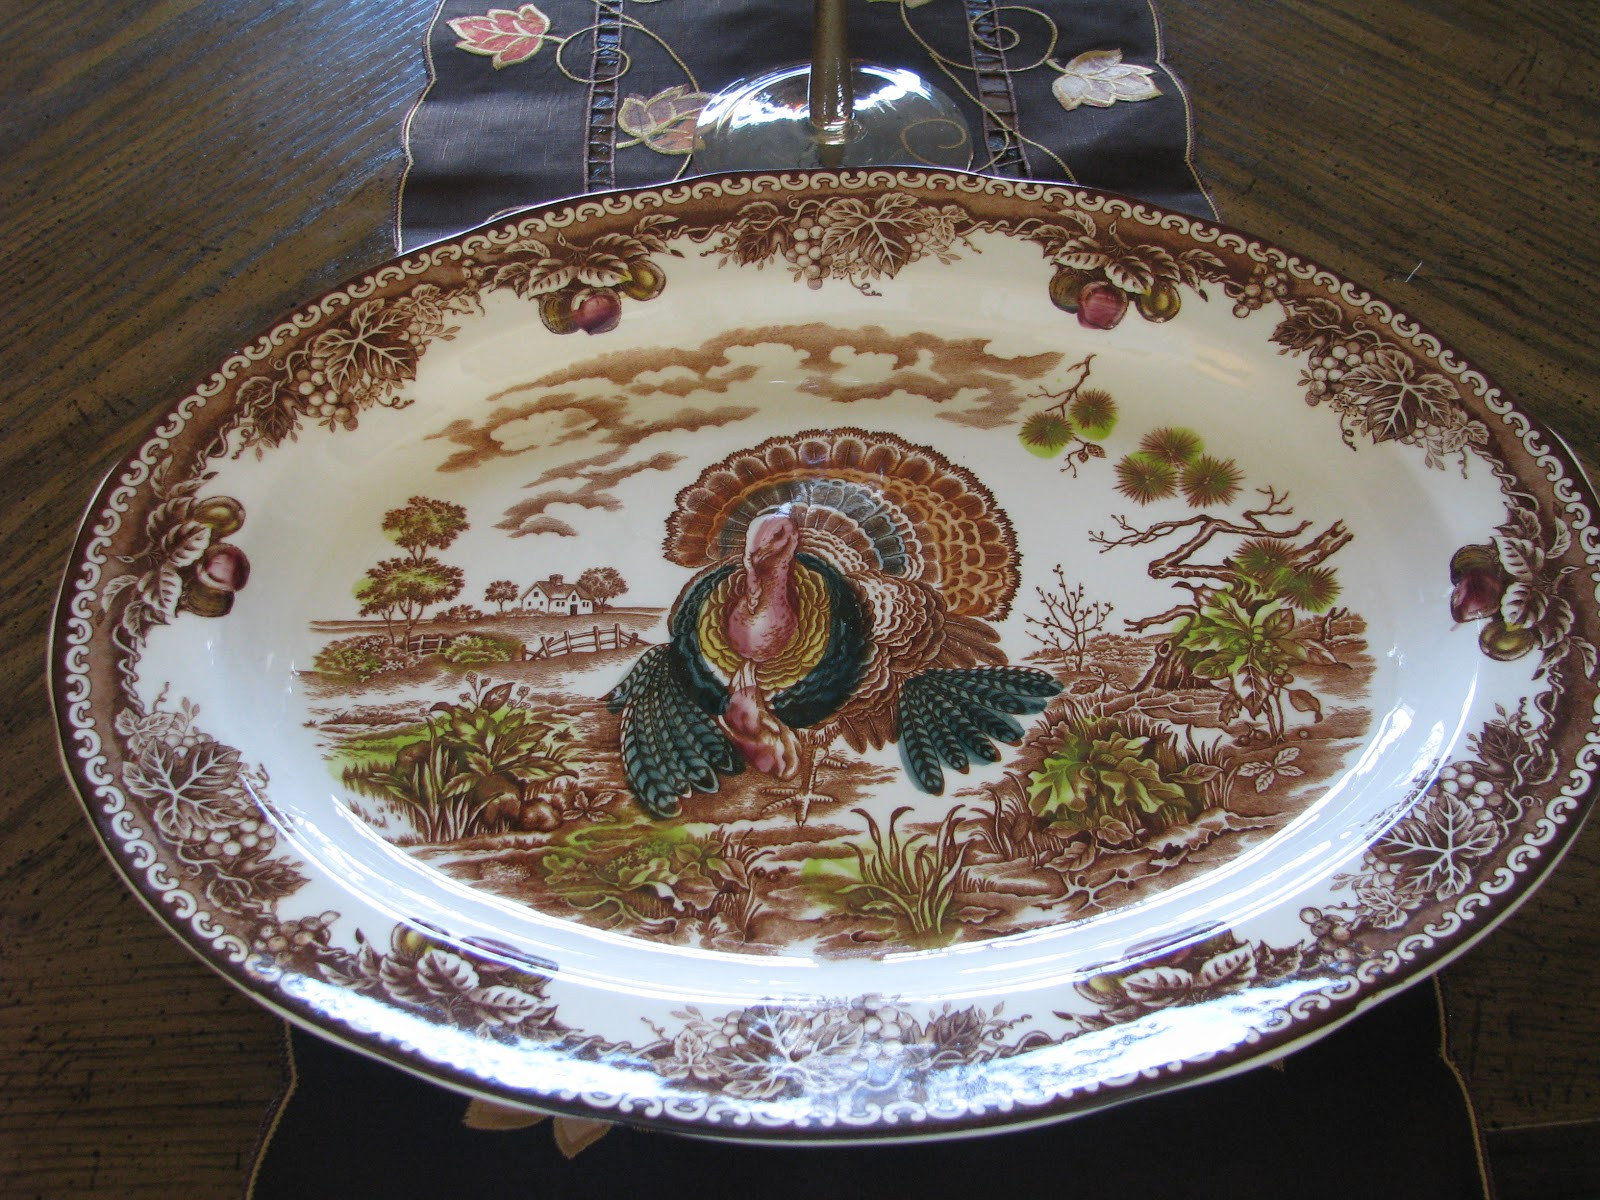 Turkey Platters Thanksgiving  Designs by Pinky My New Turkey Platter